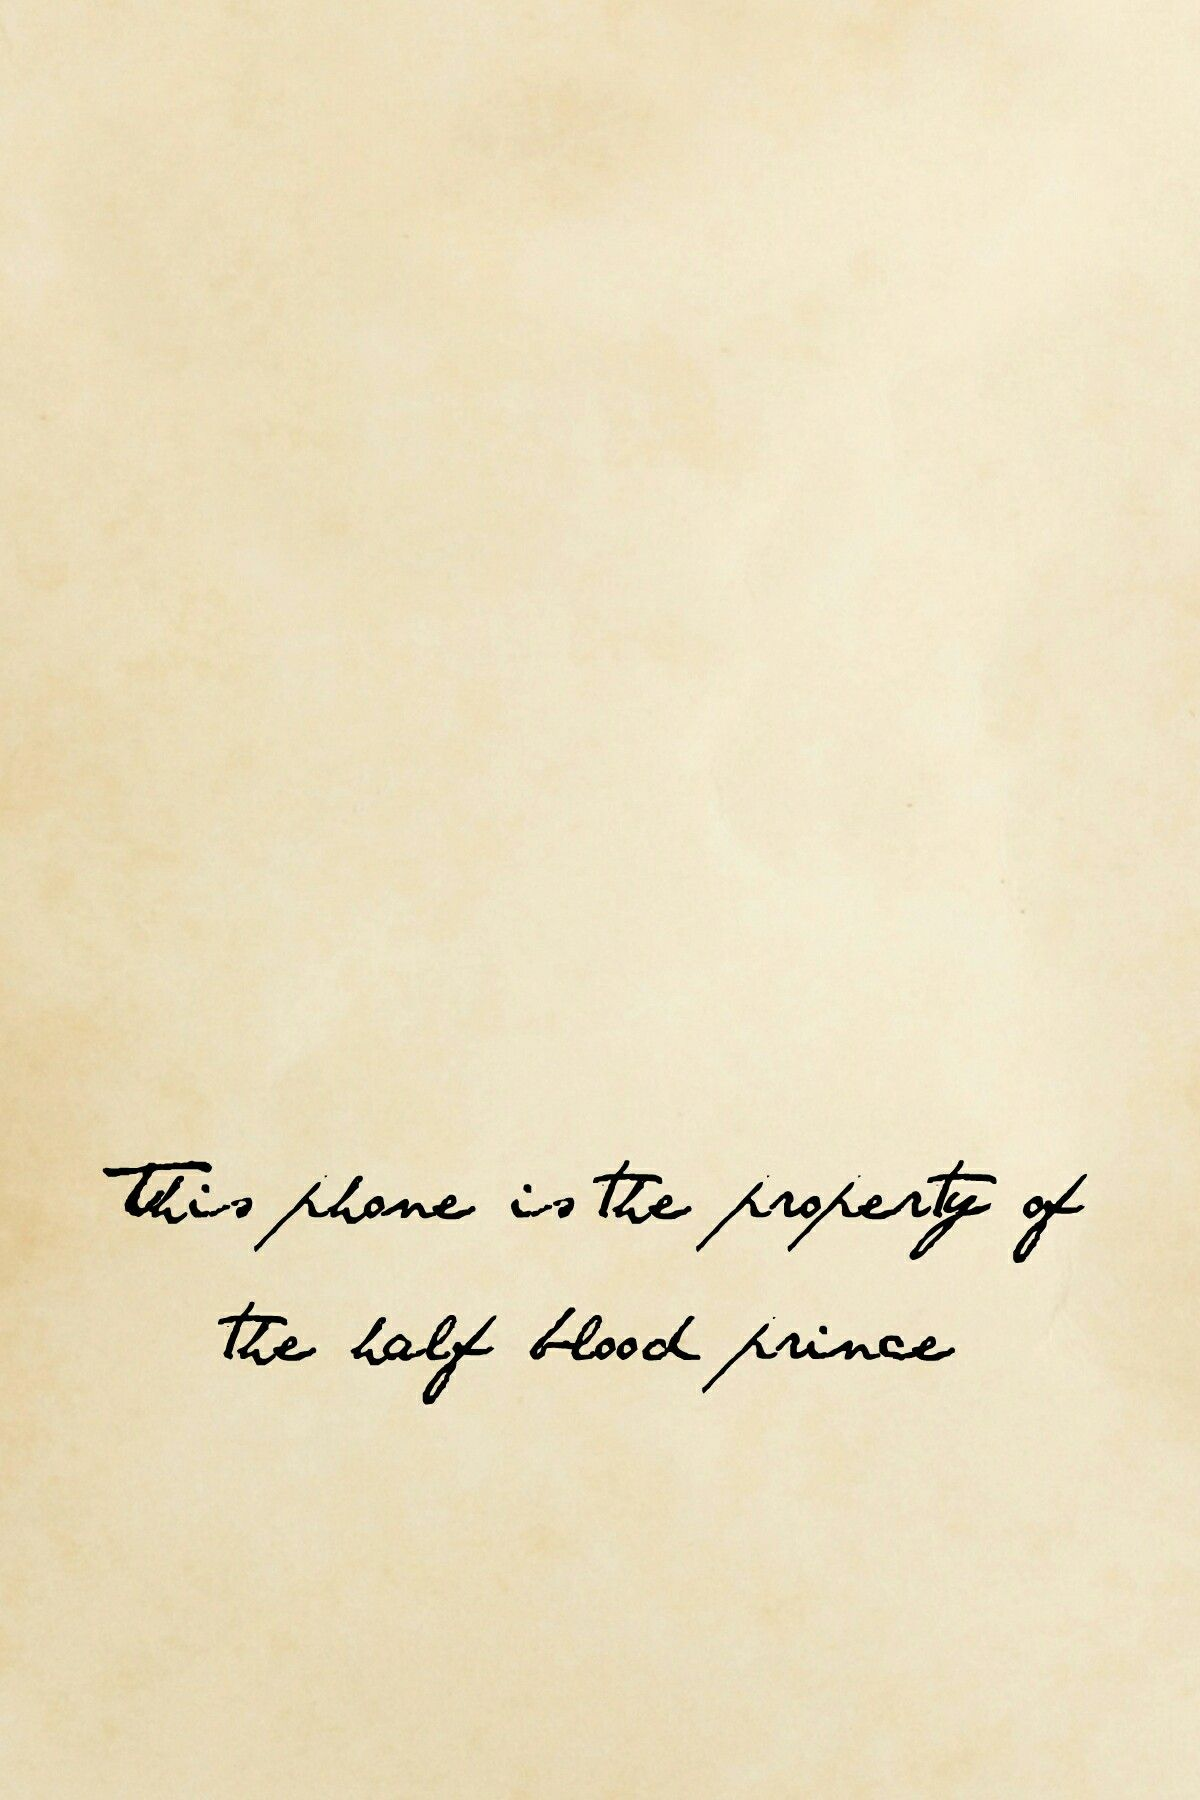 Download Wallpaper Harry Potter Letter - e15f9654f855b0440298512faa795fc5  Image_266869.jpg